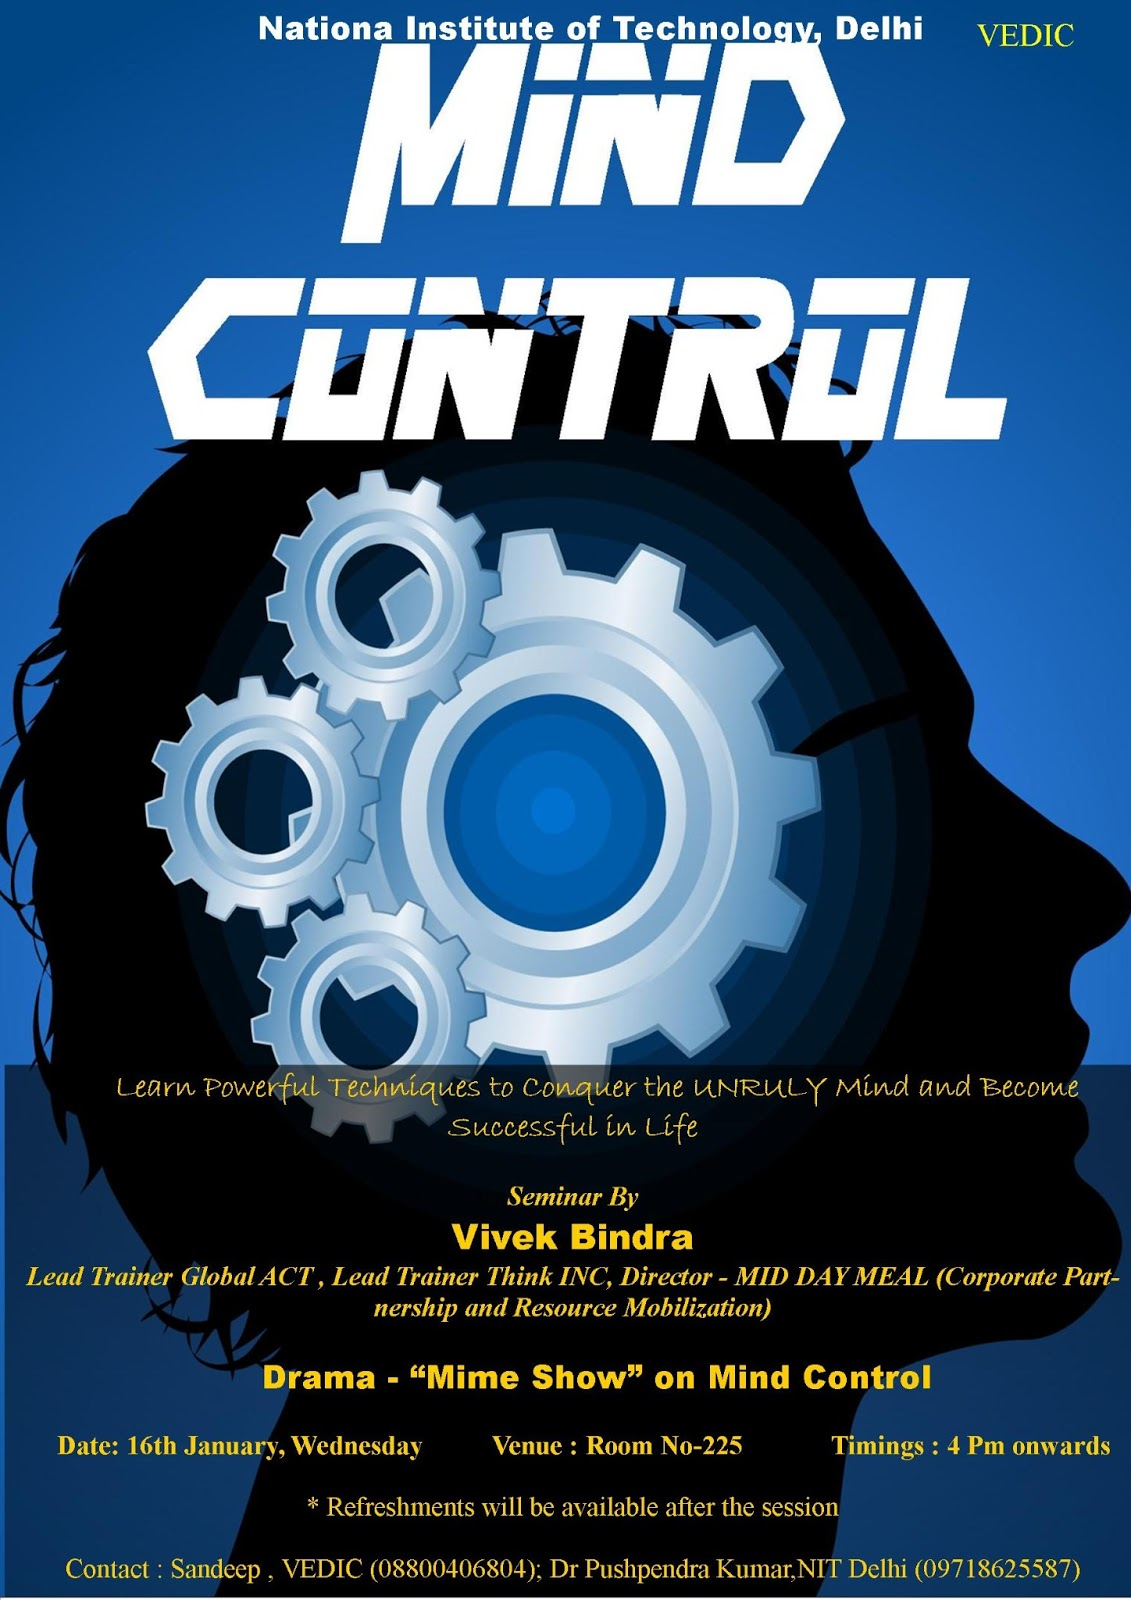 Mind control techniques - Art Of Mind Control Seminar Nit Engineering College Dwarka